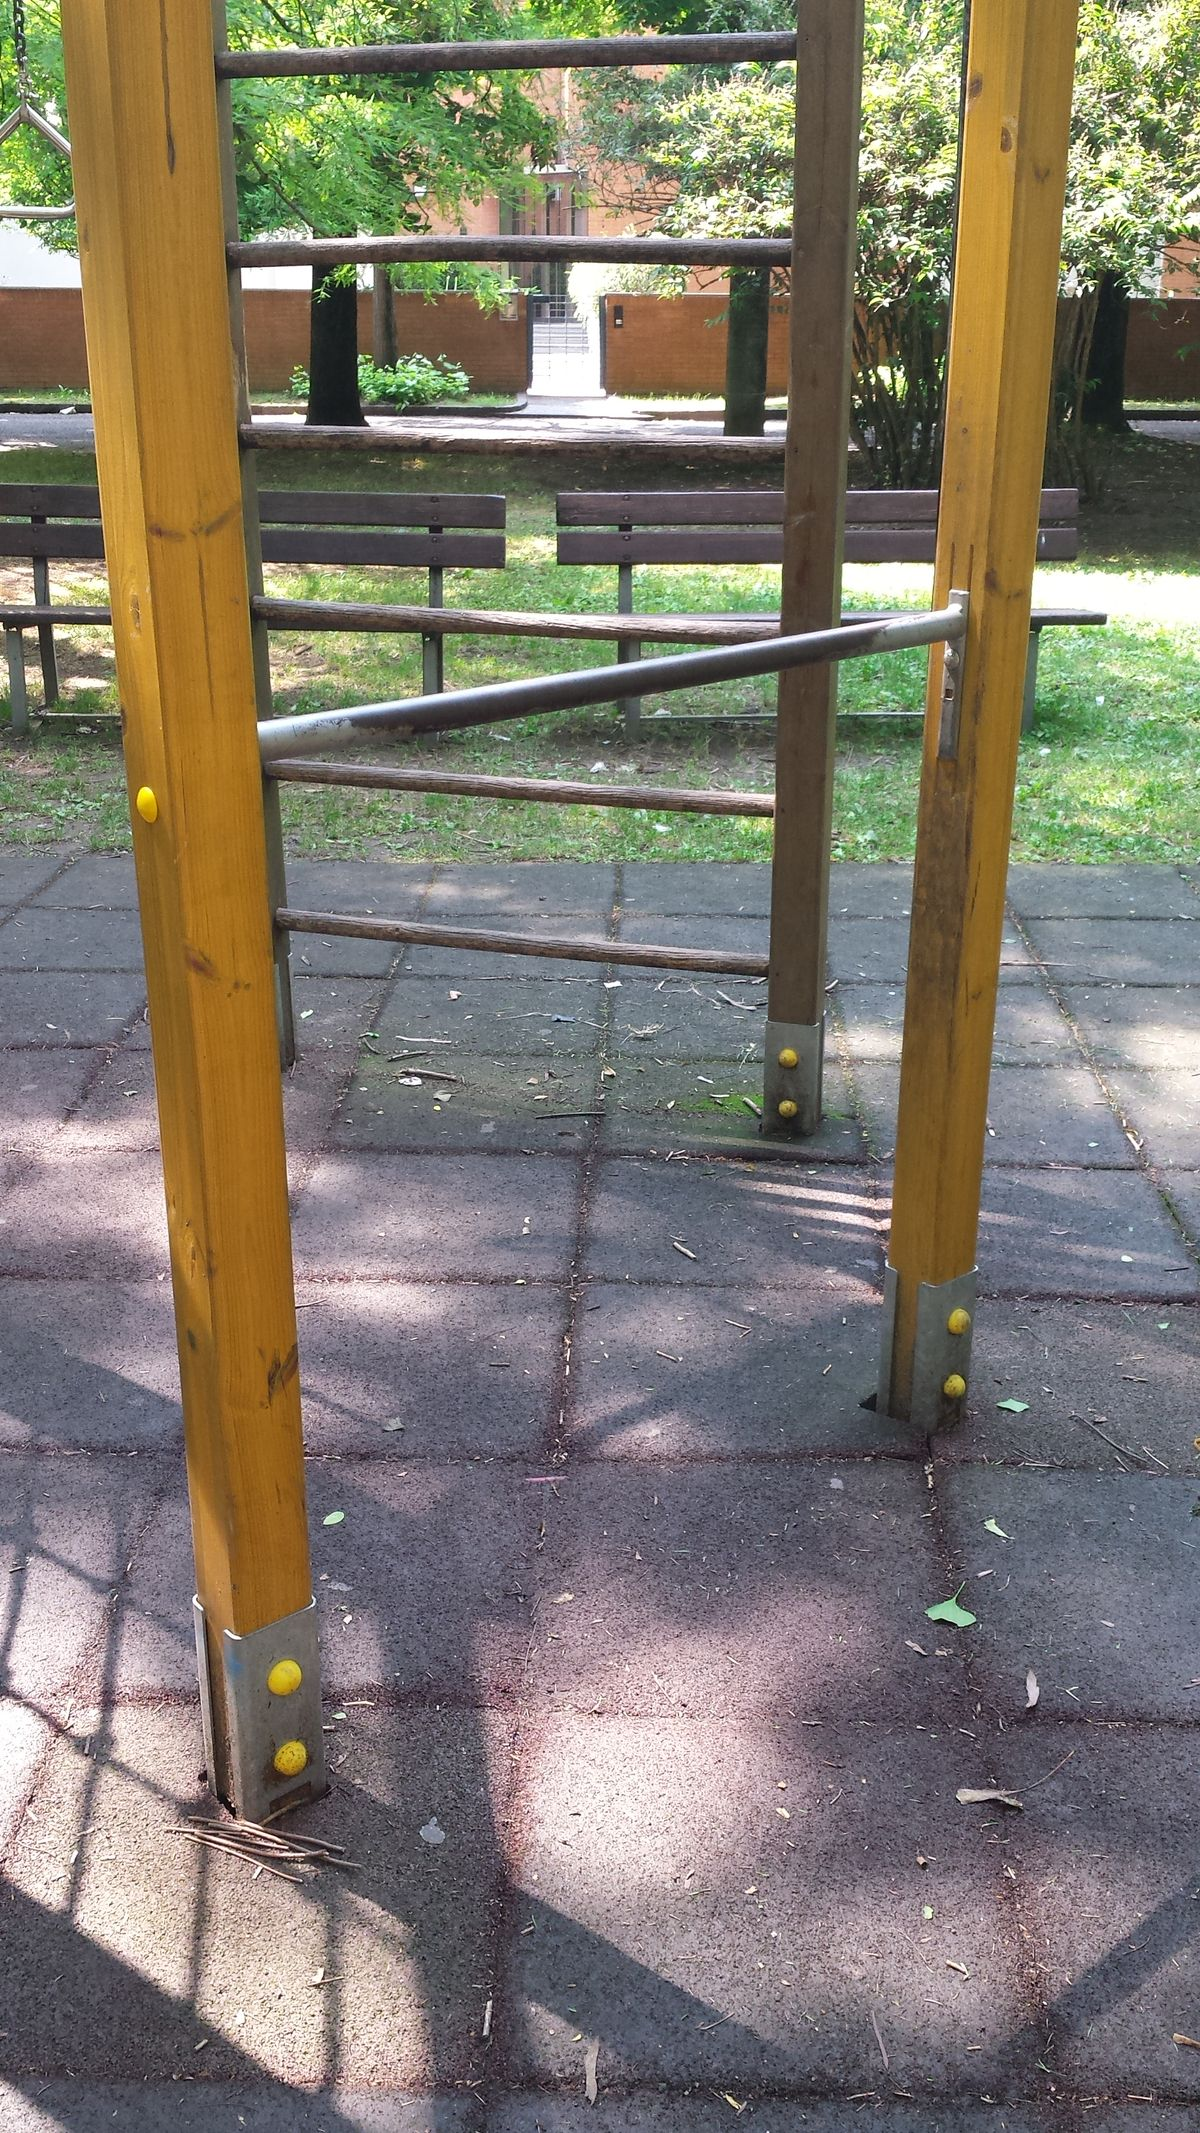 Soliera - Calisthenics Gym - Parco della Resistenza - 2